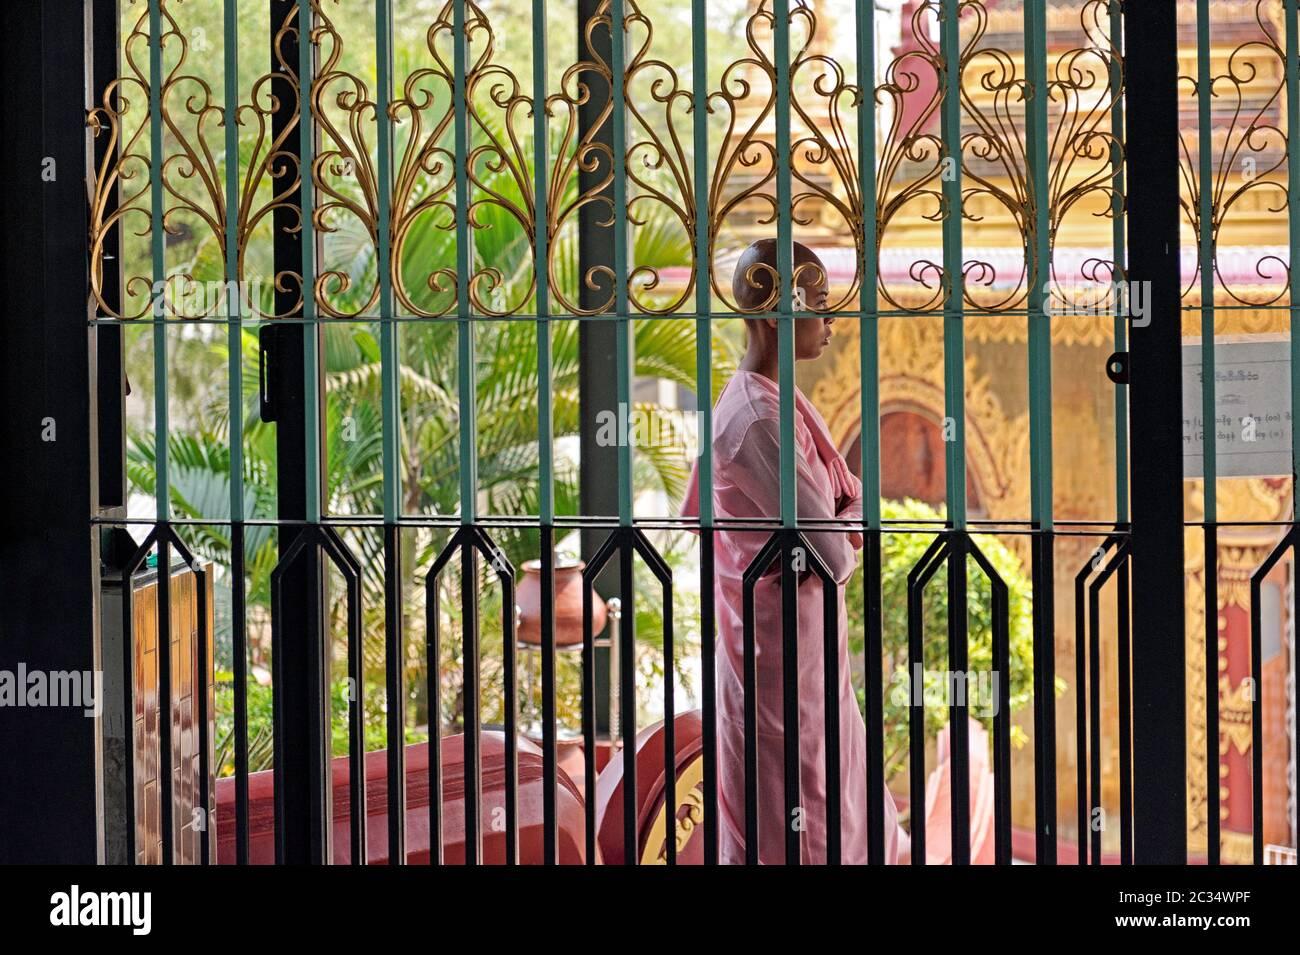 novice-nun-at-the-entrance-to-the-buddha-shrine-at-the-sakyadhita-thilashin-nunnery-school-in-sagaing-myanmar-2C34WPF.jpg